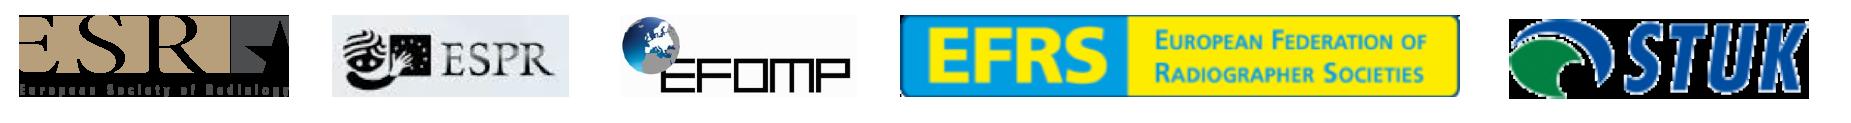 logos_eurosafe2